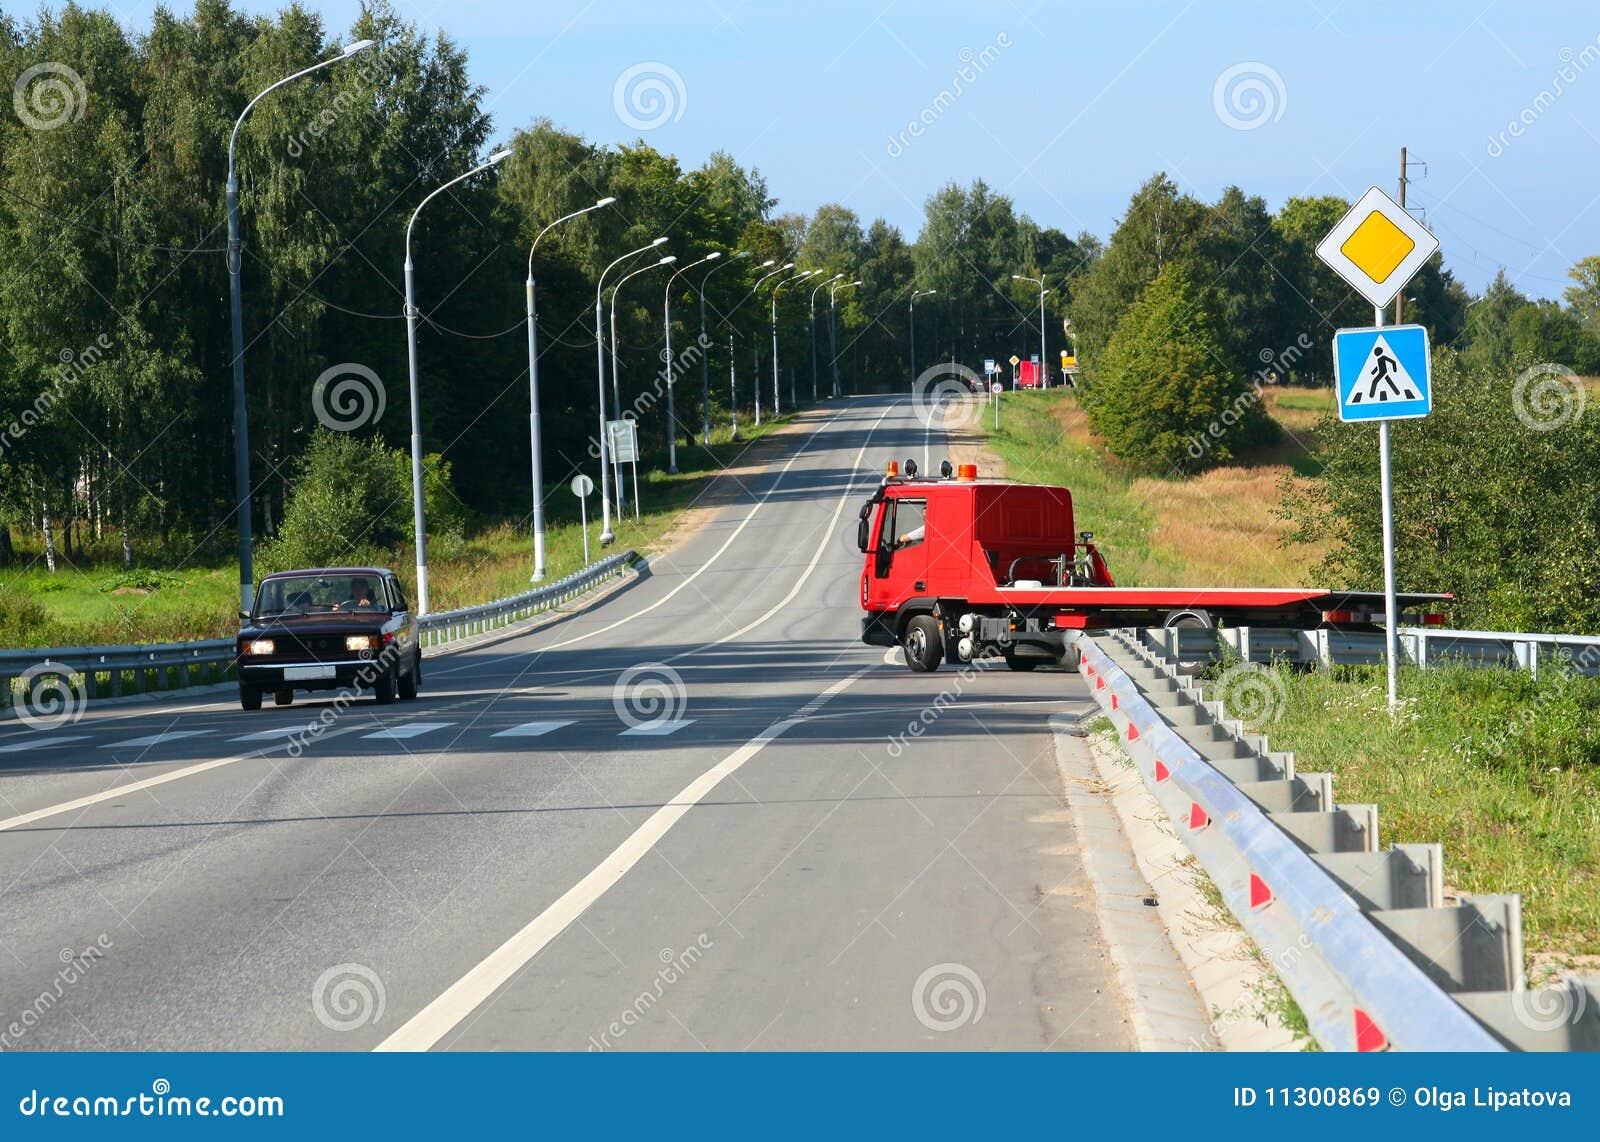 Roter Schleppseil-LKW. Verkehrsschilder